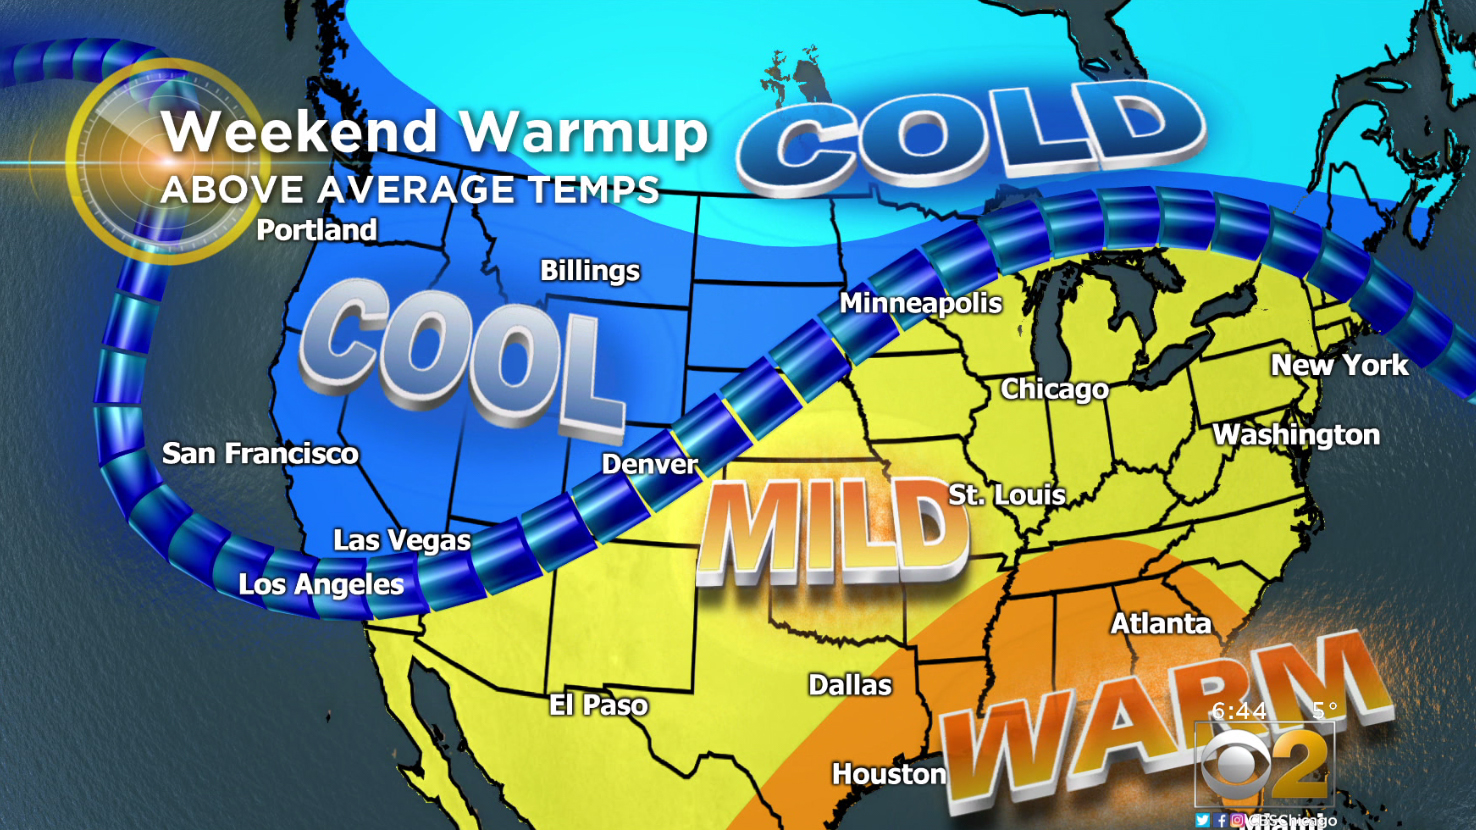 Chicago Weather Forecast: Good-Bye Deep Freeze, Hello Warm Weekend – CBS Chicago